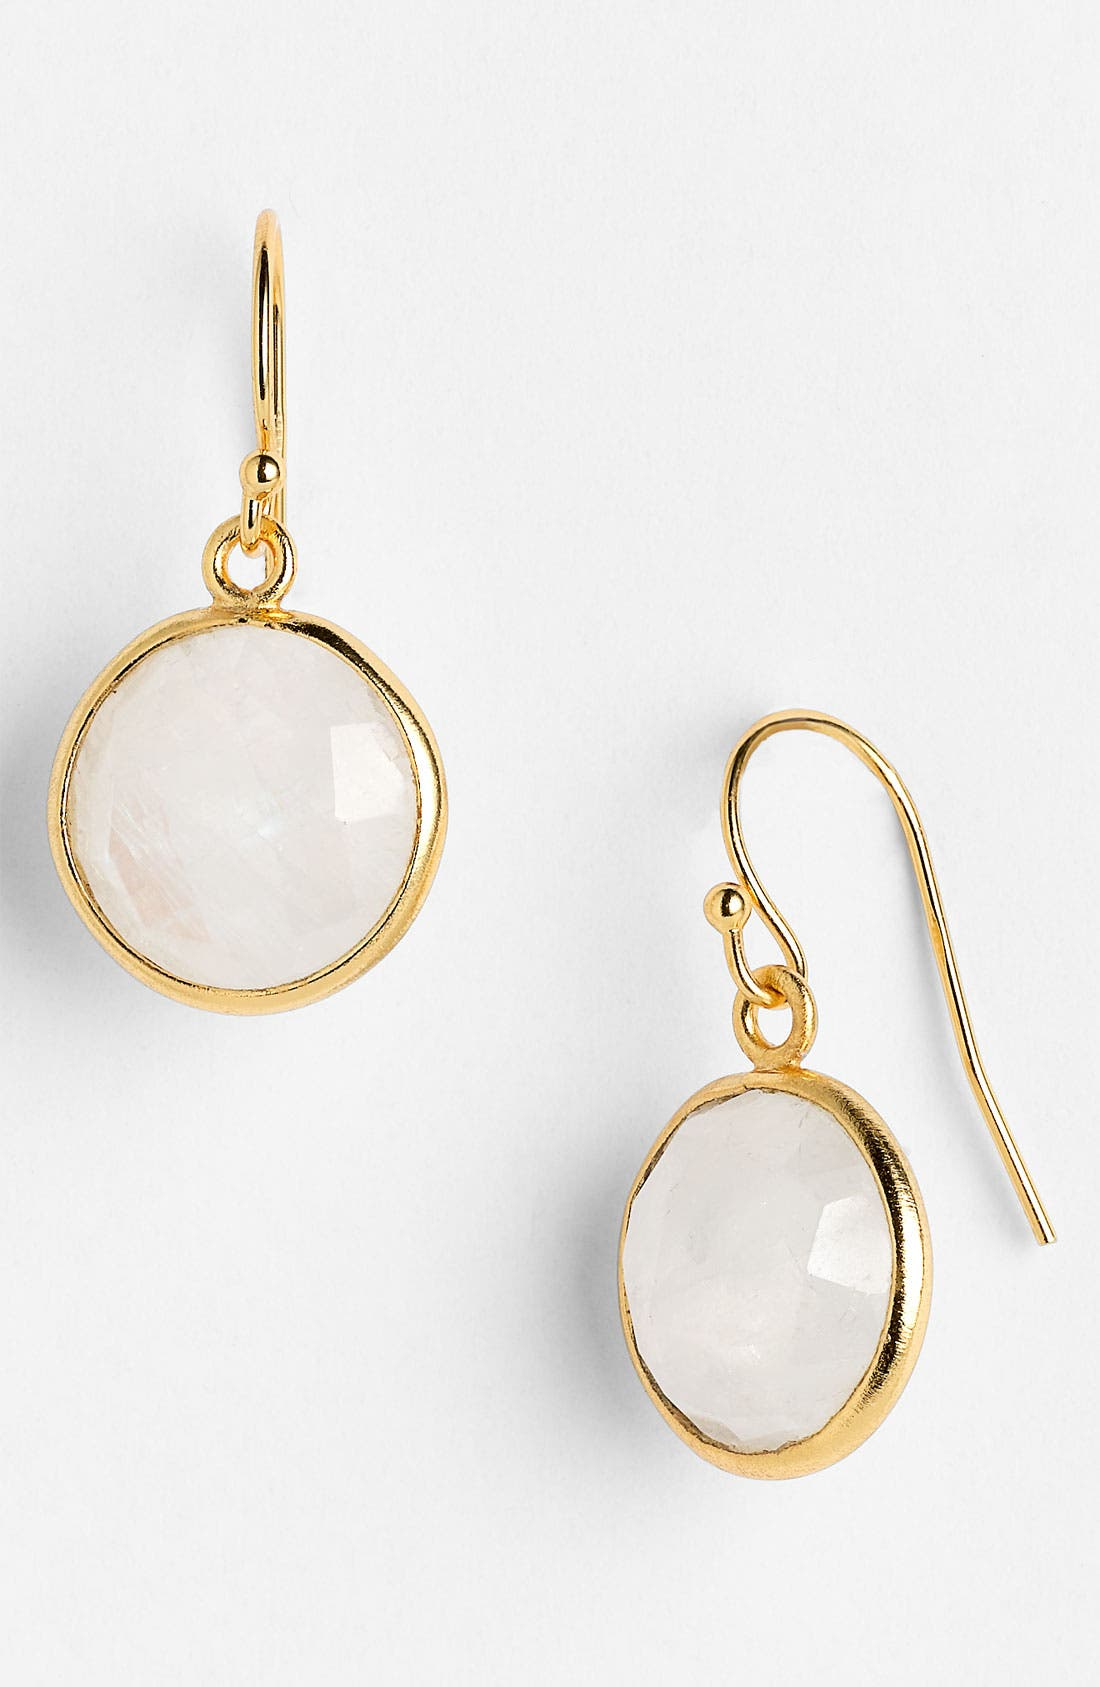 Alternate Image 1 Selected - NuNu Designs Round Semiprecious Drop Earrings